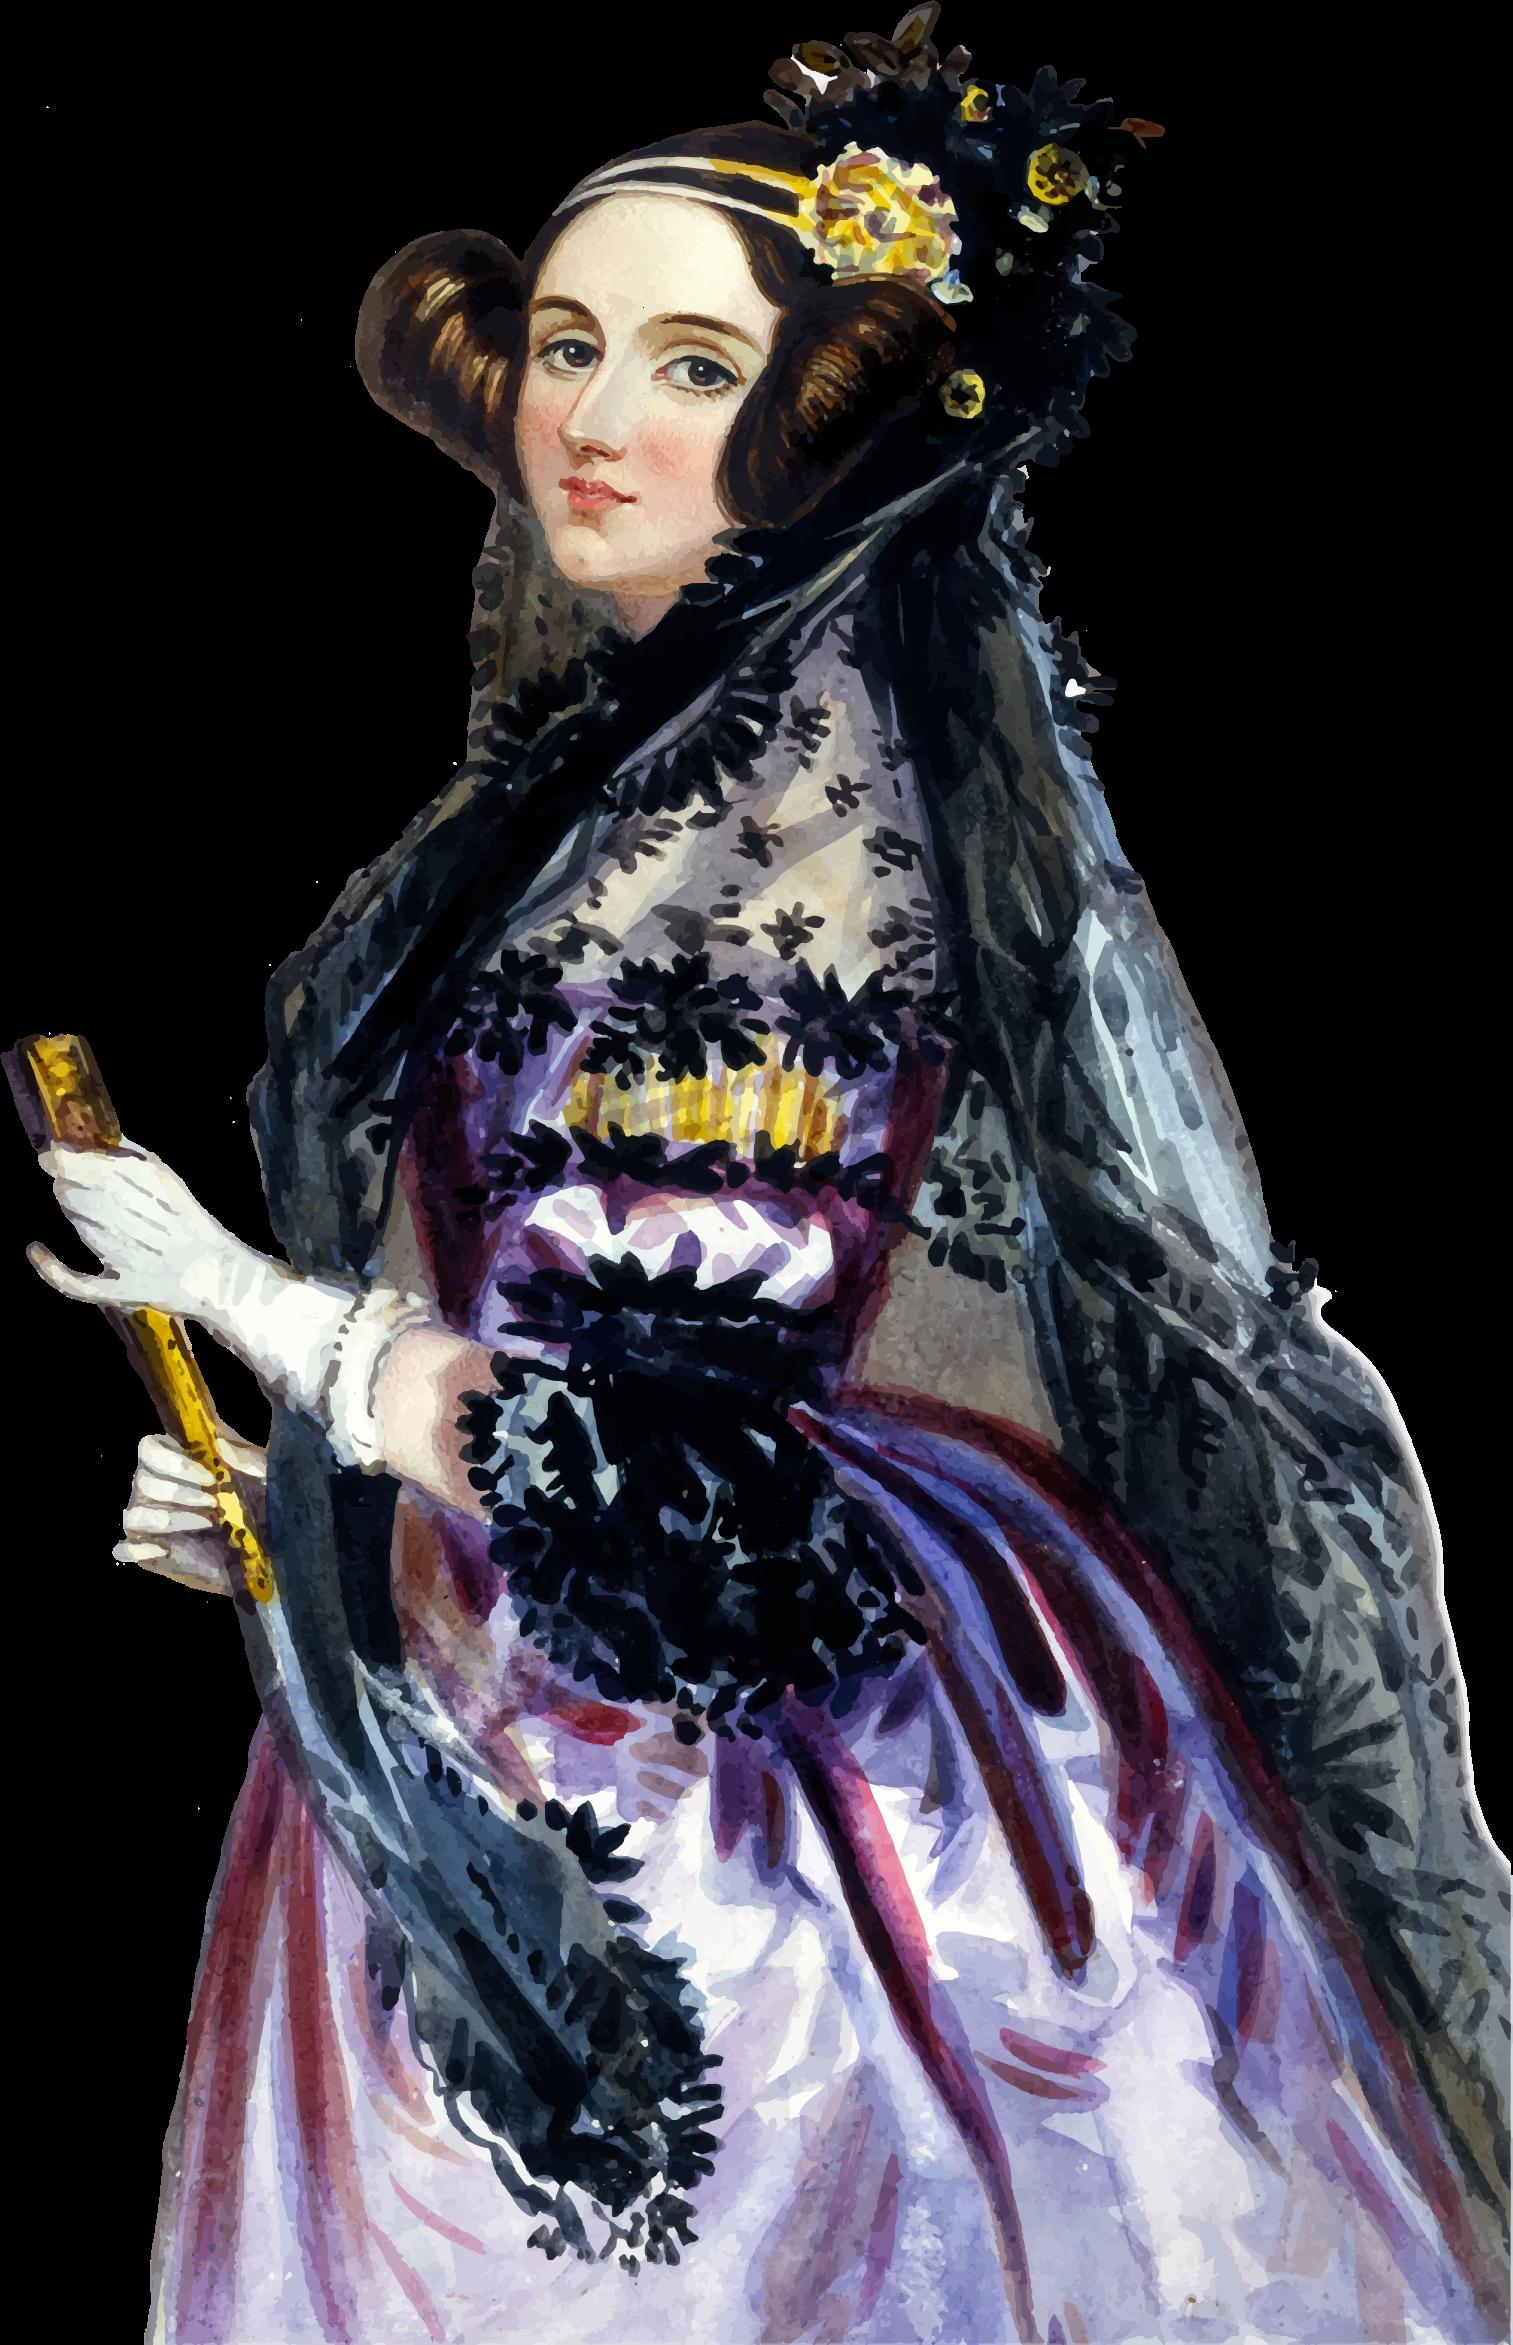 Ada Lovelace - Wikipedia Pictures of lady ada lovelace